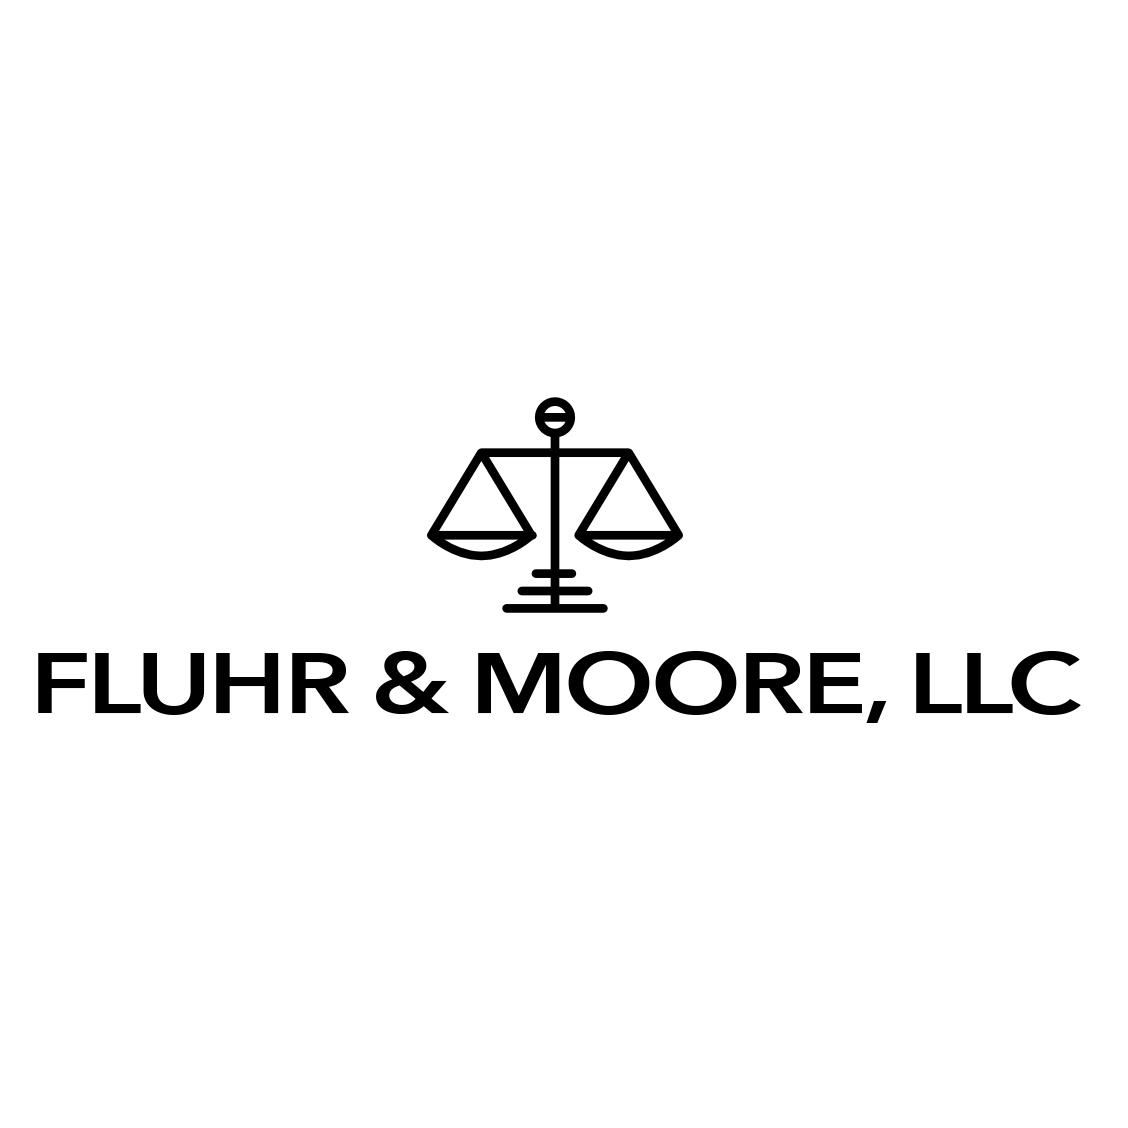 Fluhr & Moore, LLC